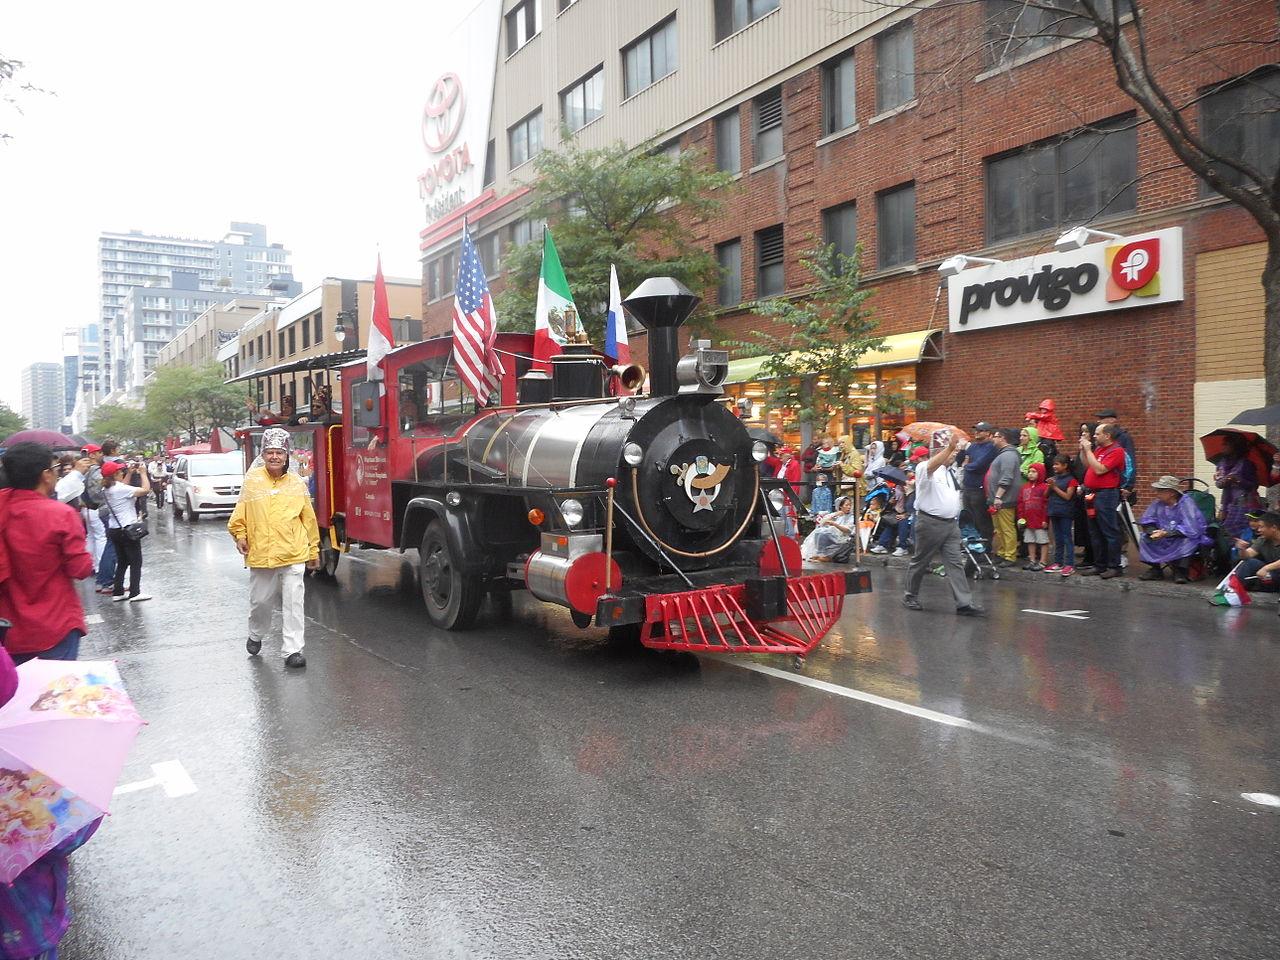 File:Canada Day 2015 on Saint Catherine Street - 145.jpg - Wikimedia